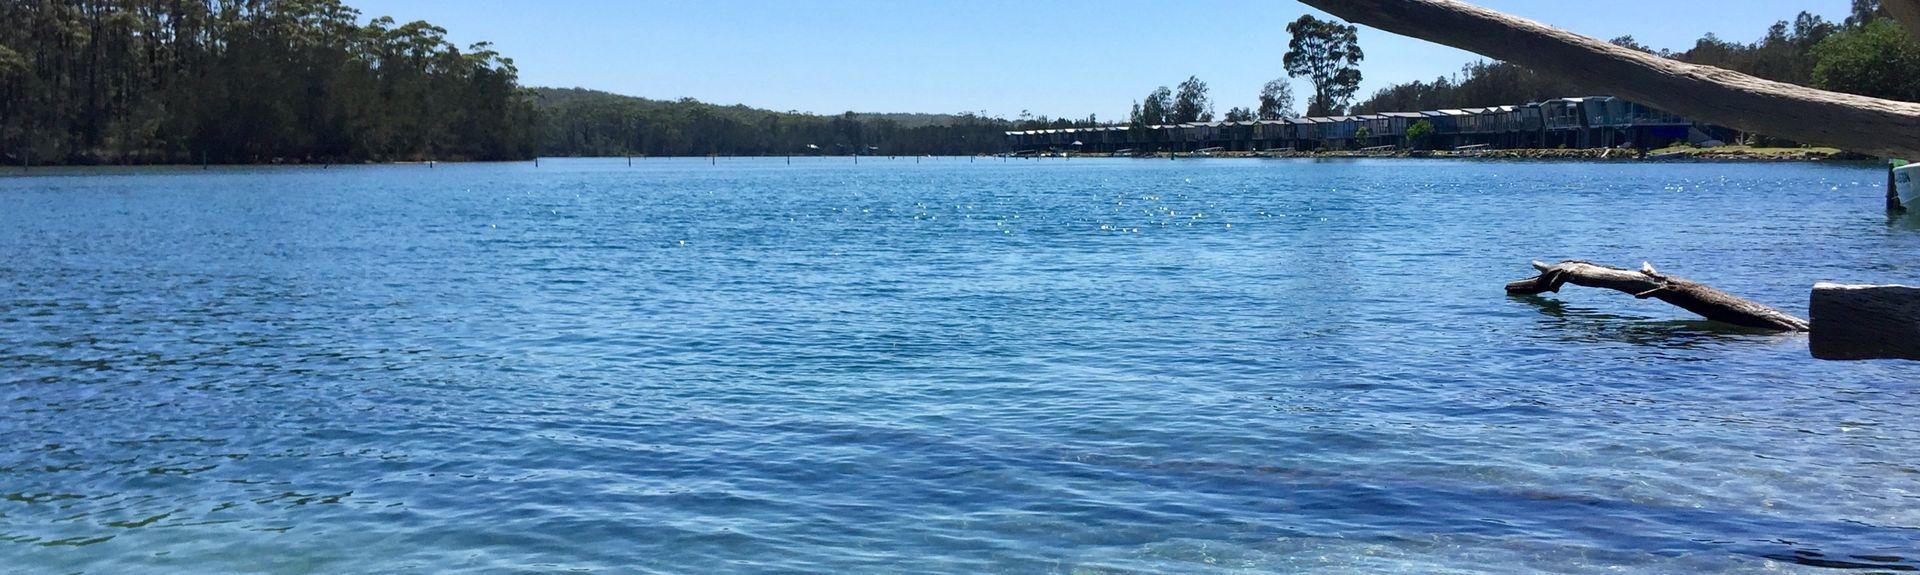 Swanhaven NSW, Australia